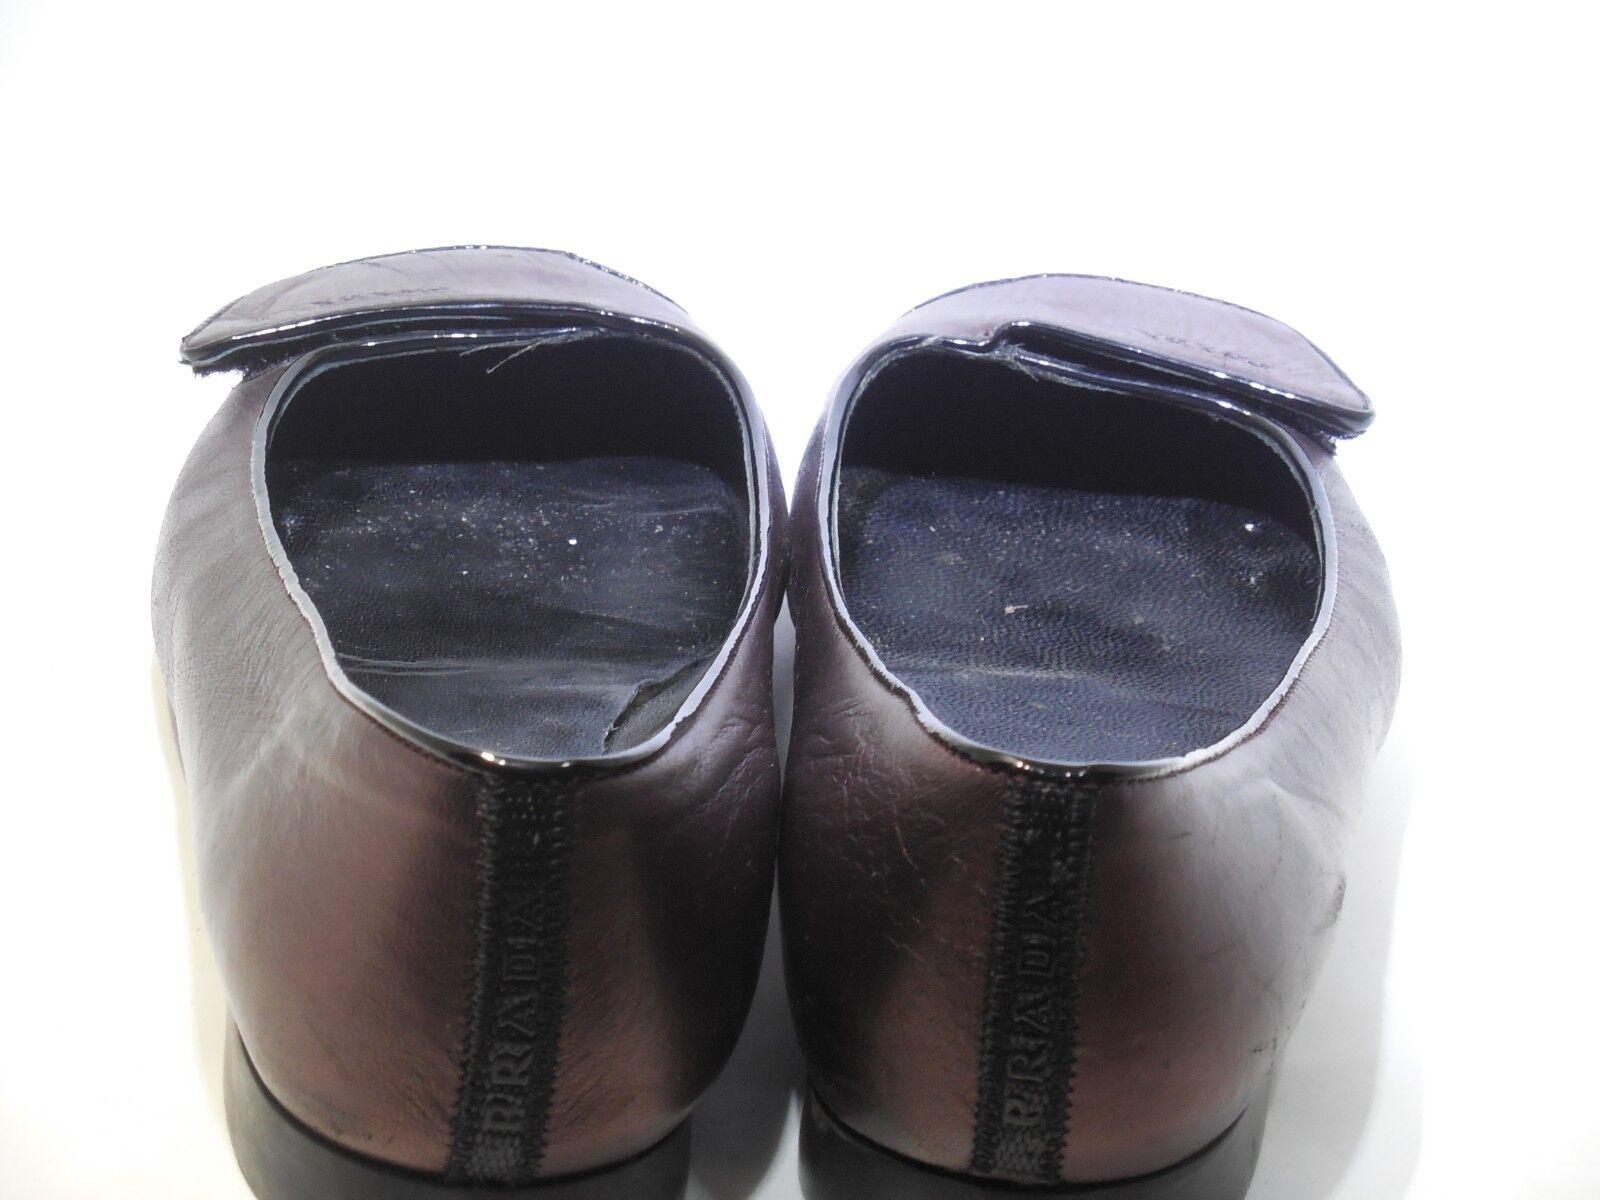 PRADA Sport Metallic Purple Black Patent Leather Flat shoes shoes shoes Velcro Flap Closure fc6e42